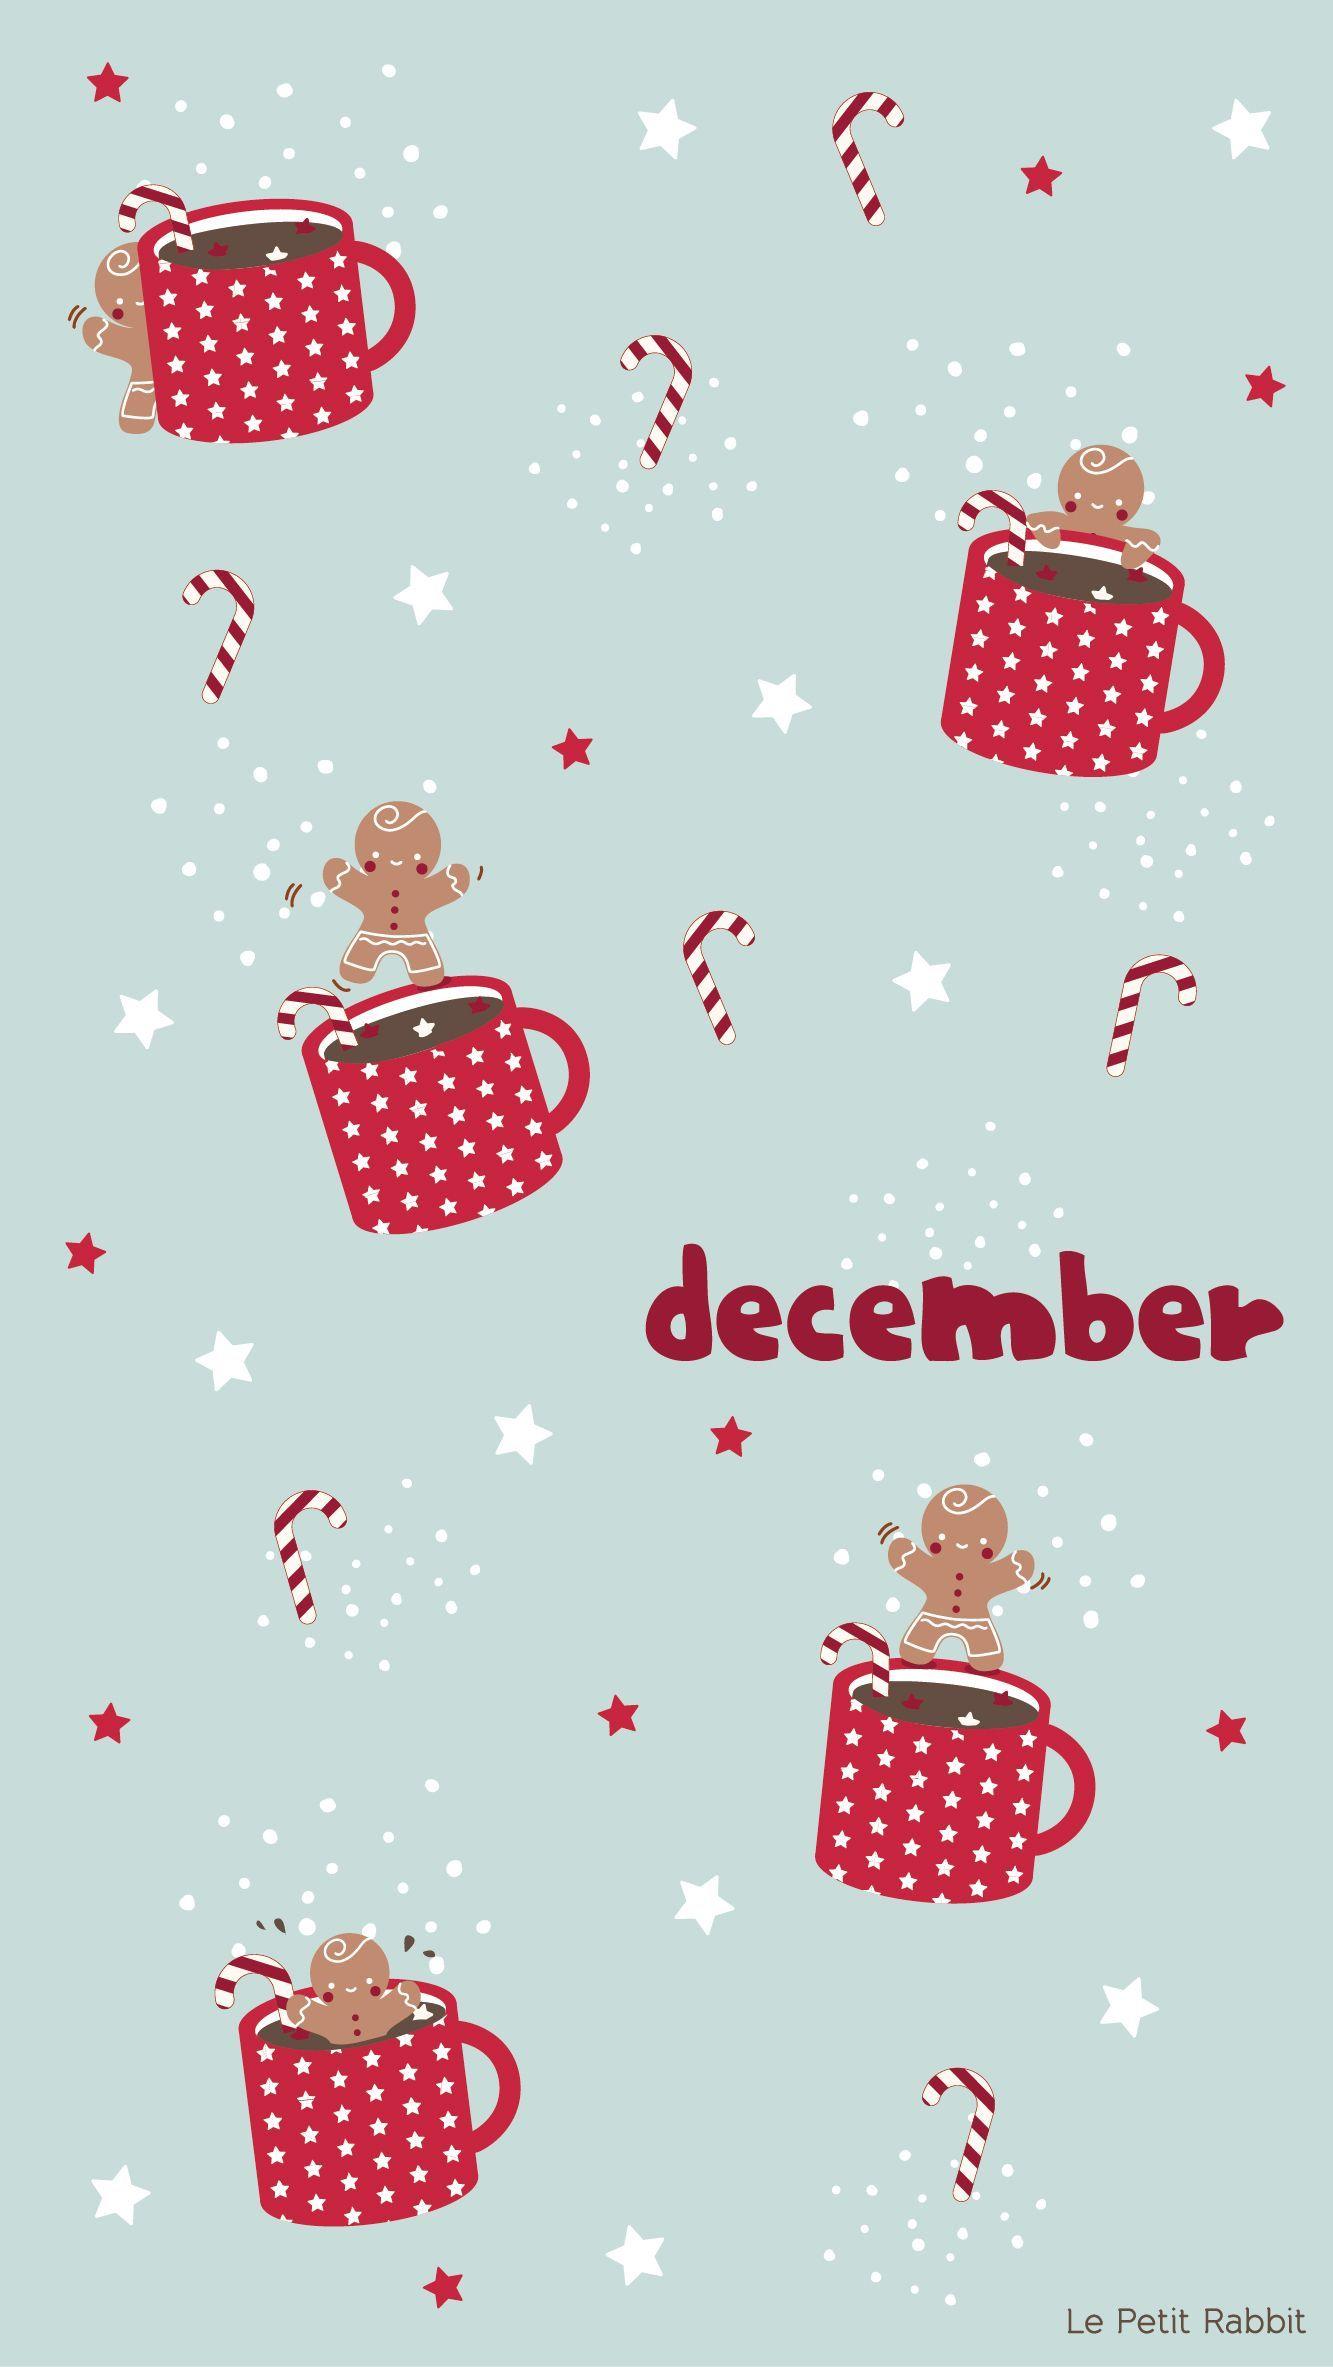 Original Christmas Wallpapers For A Girl Like You Christmas Phone Wallpaper Cute Christmas Wallpaper Holiday Wallpaper